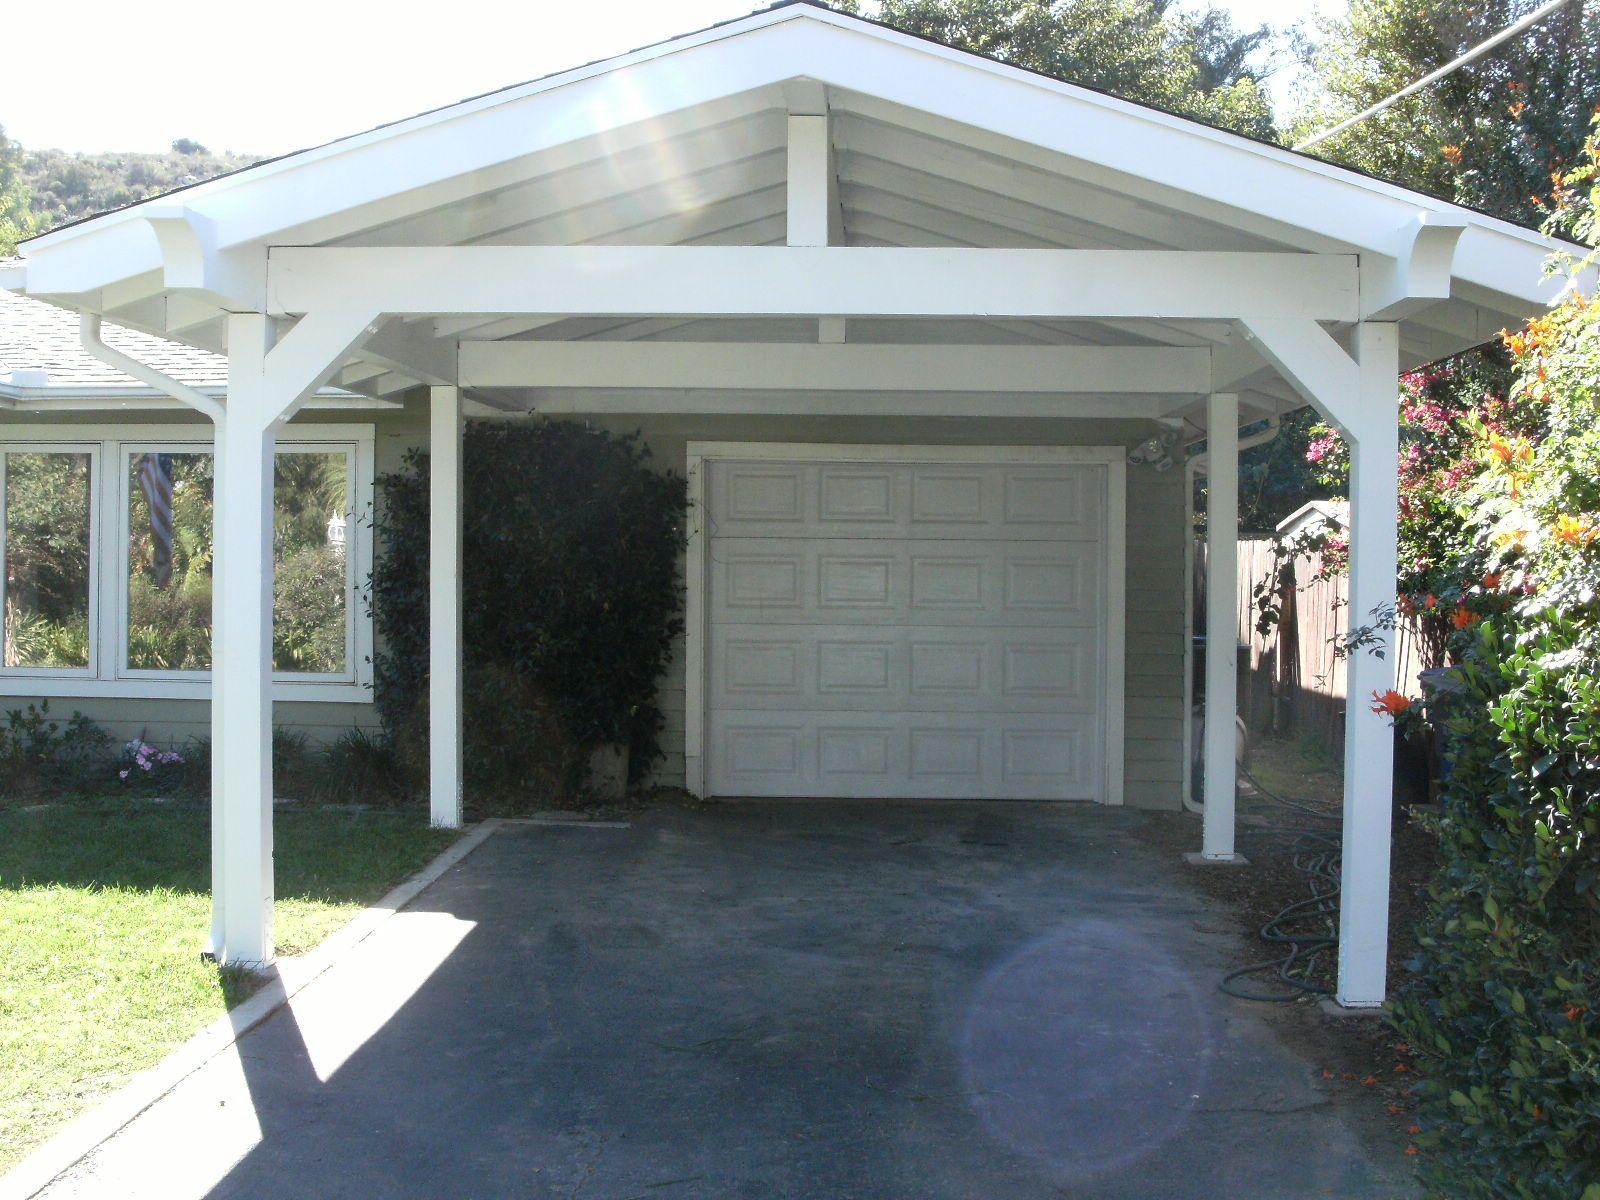 Carport Attached To House Carport Designs Garages Carports Porches Decks Custom